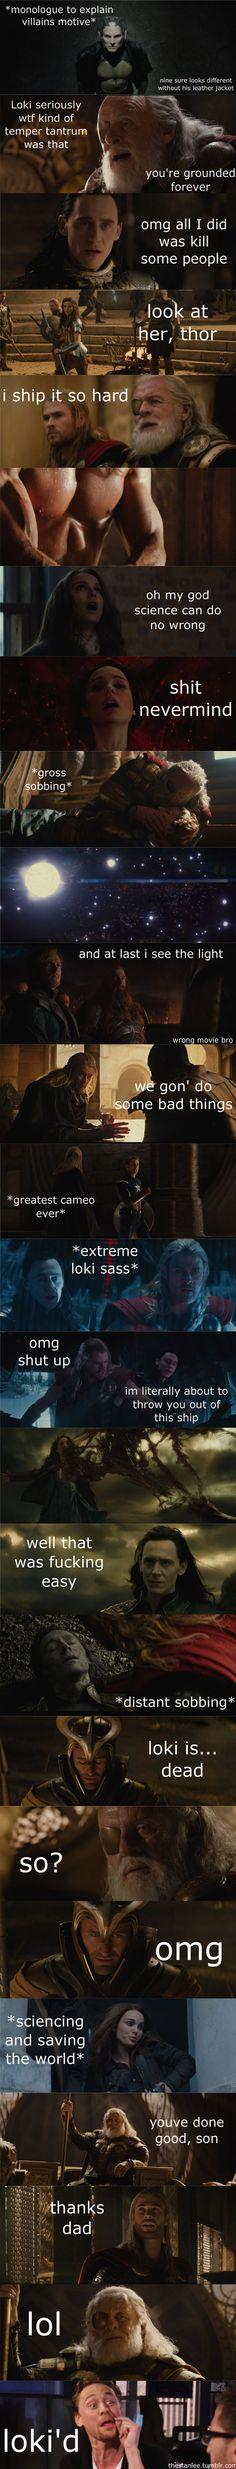 Marvel in a Nutshell: Thor: The Dark World